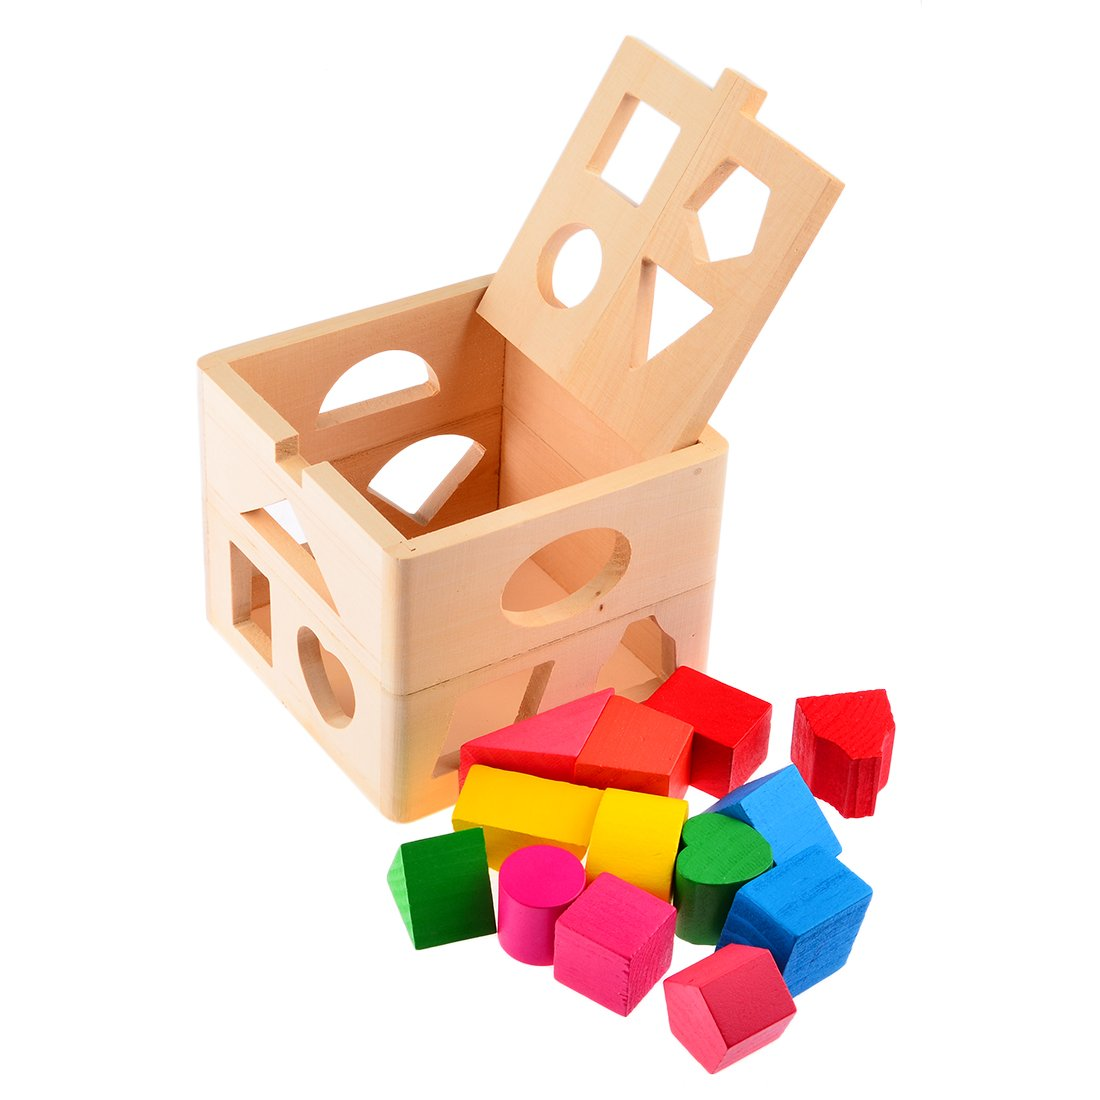 Intelligence Box, Yamix 13 Holes Intelligence Box Wooden Shape Sorter Geometric Sorting Box Cognitive Matching Wooden Shape Color Recognition Building Blocks Baby Kids Children Eductional Toy